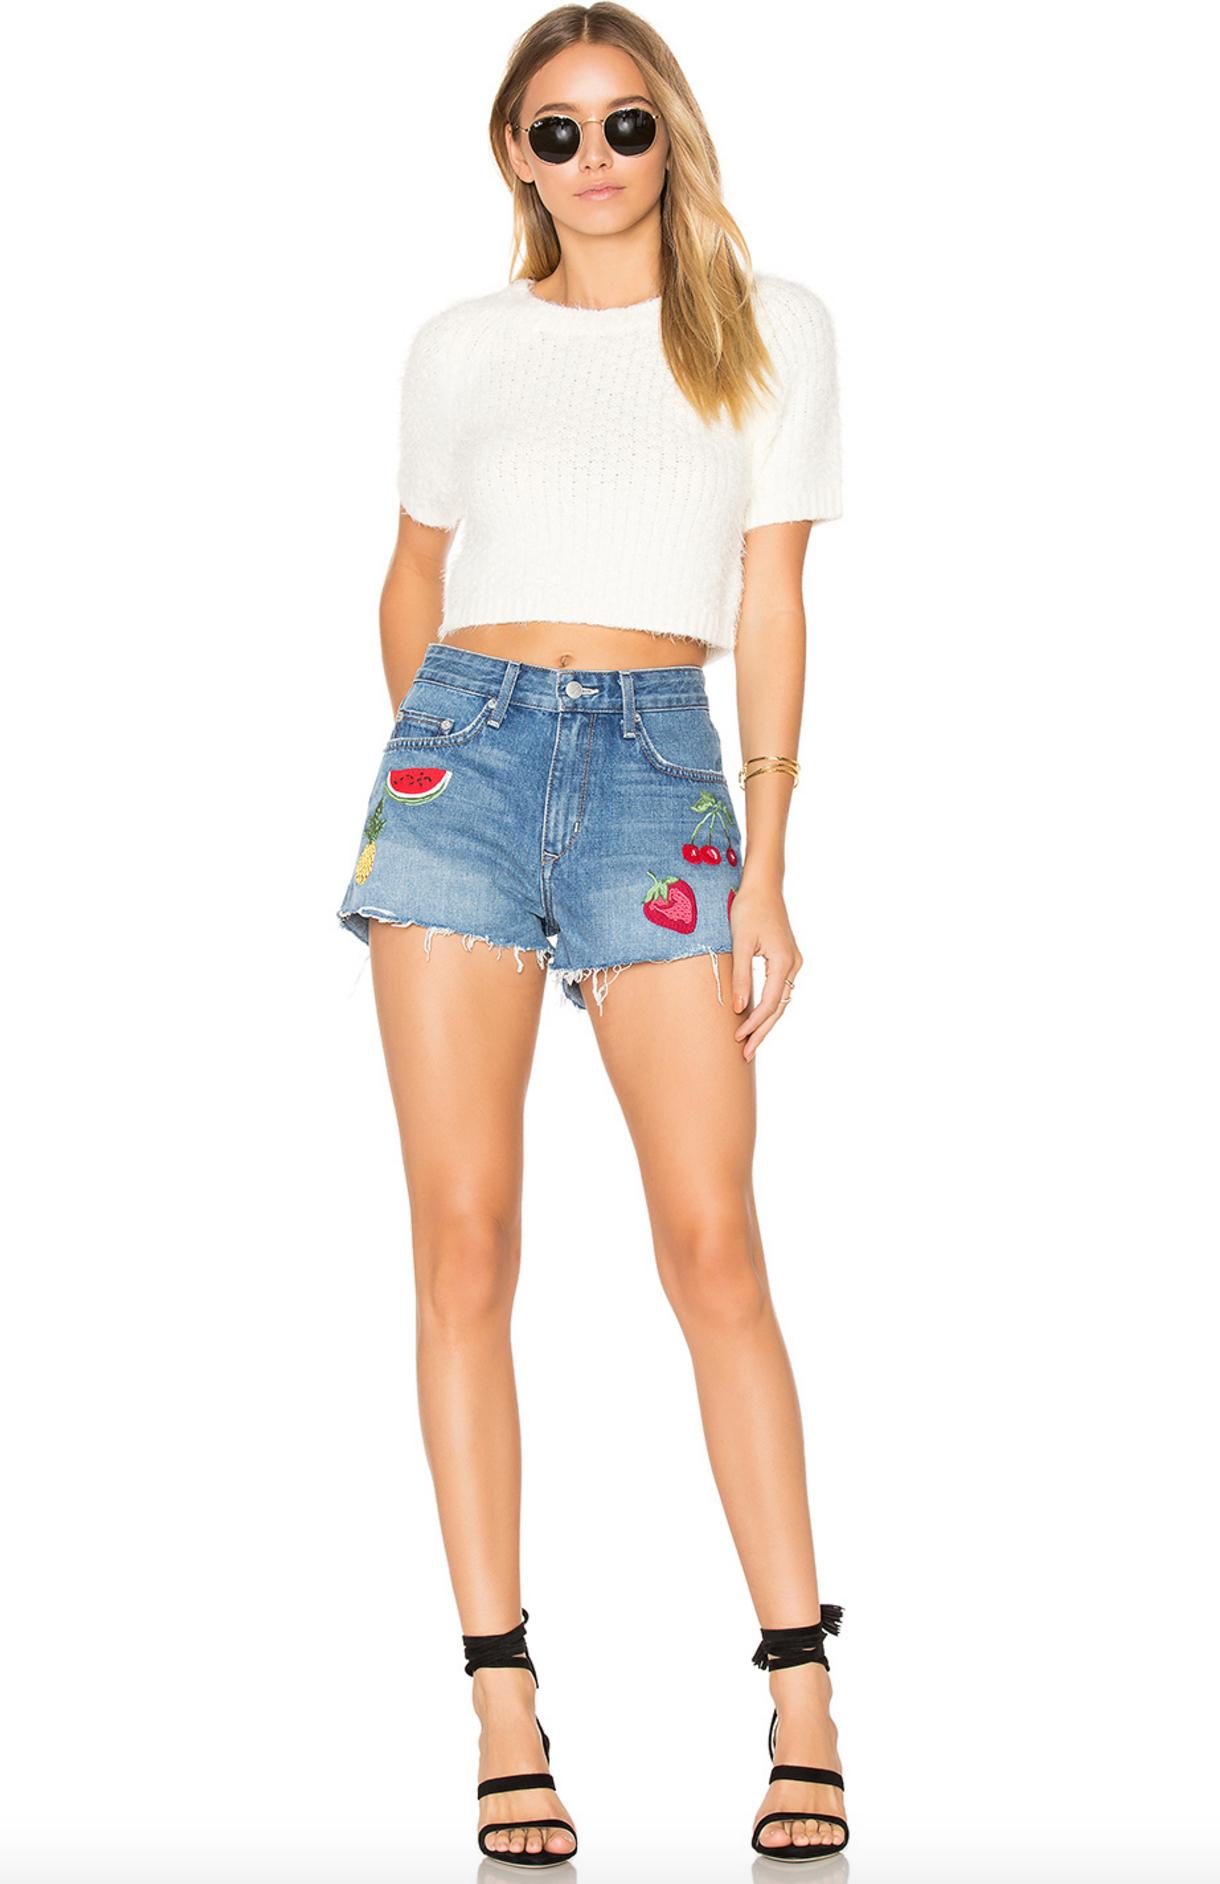 Lovers & Friends X revolve jack shorts $182